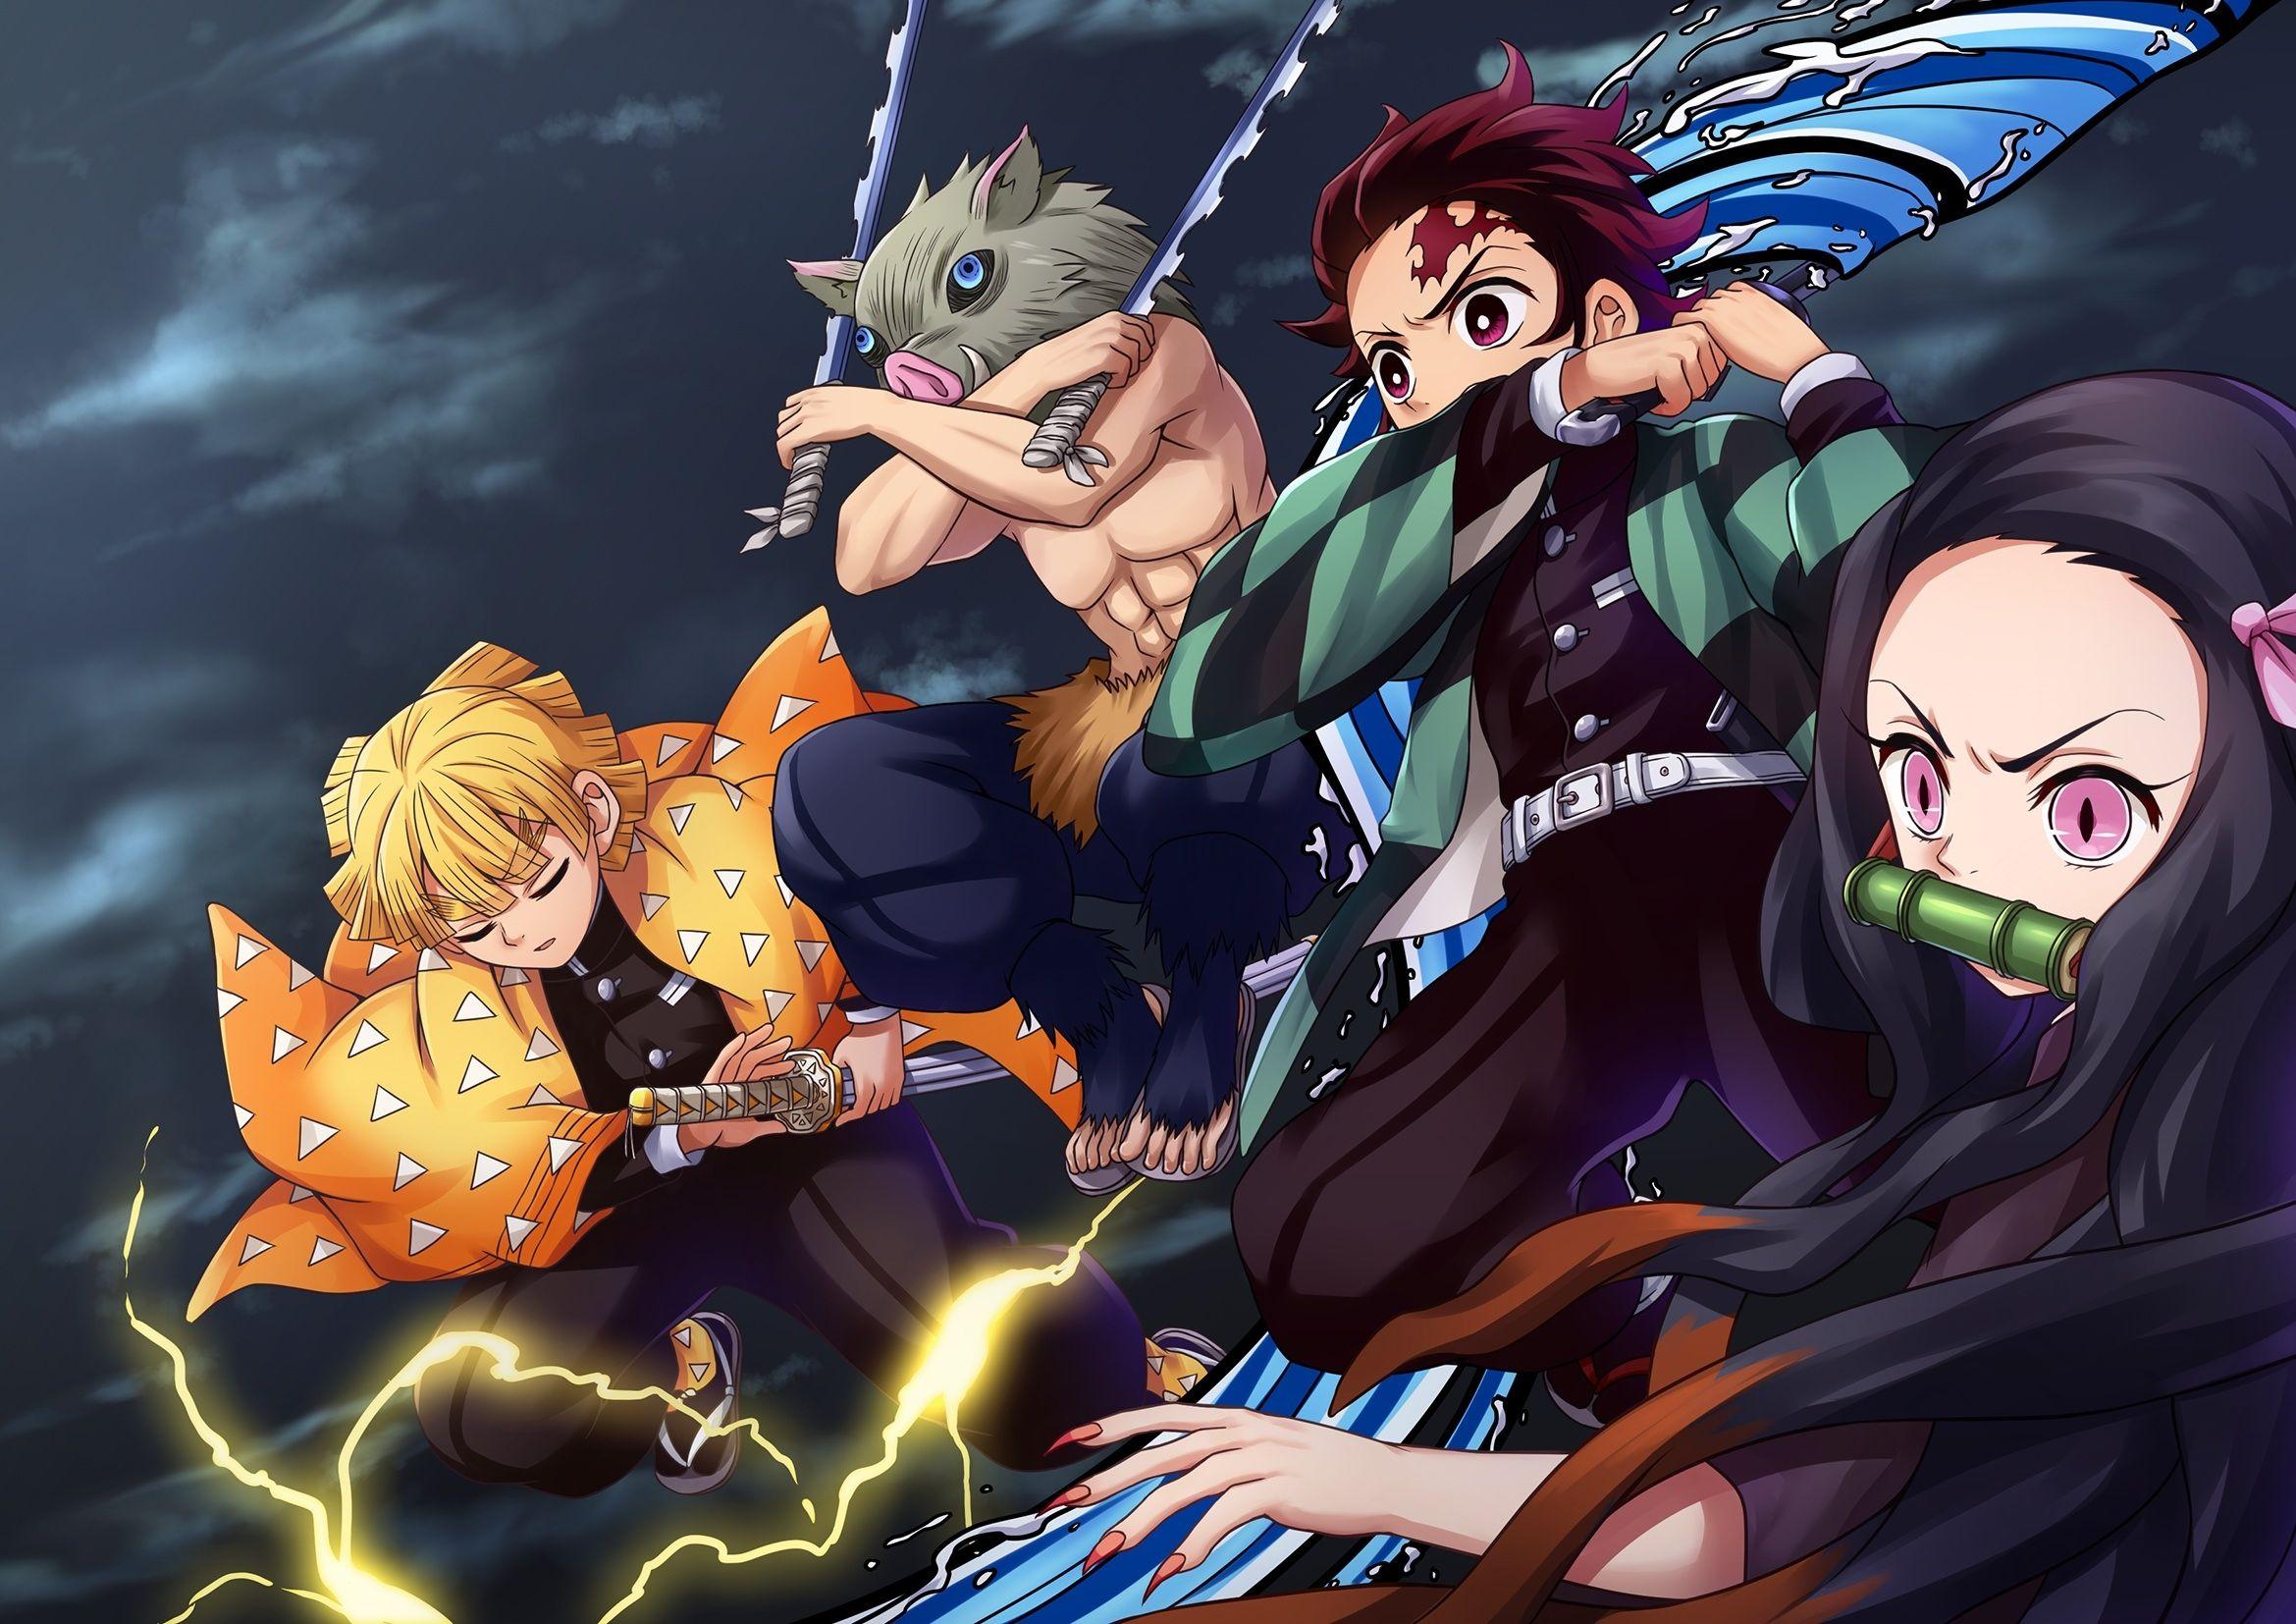 Kimetsu No Yaiba Animes Wallpapers Personagens De Anime Desenhos Dragonball